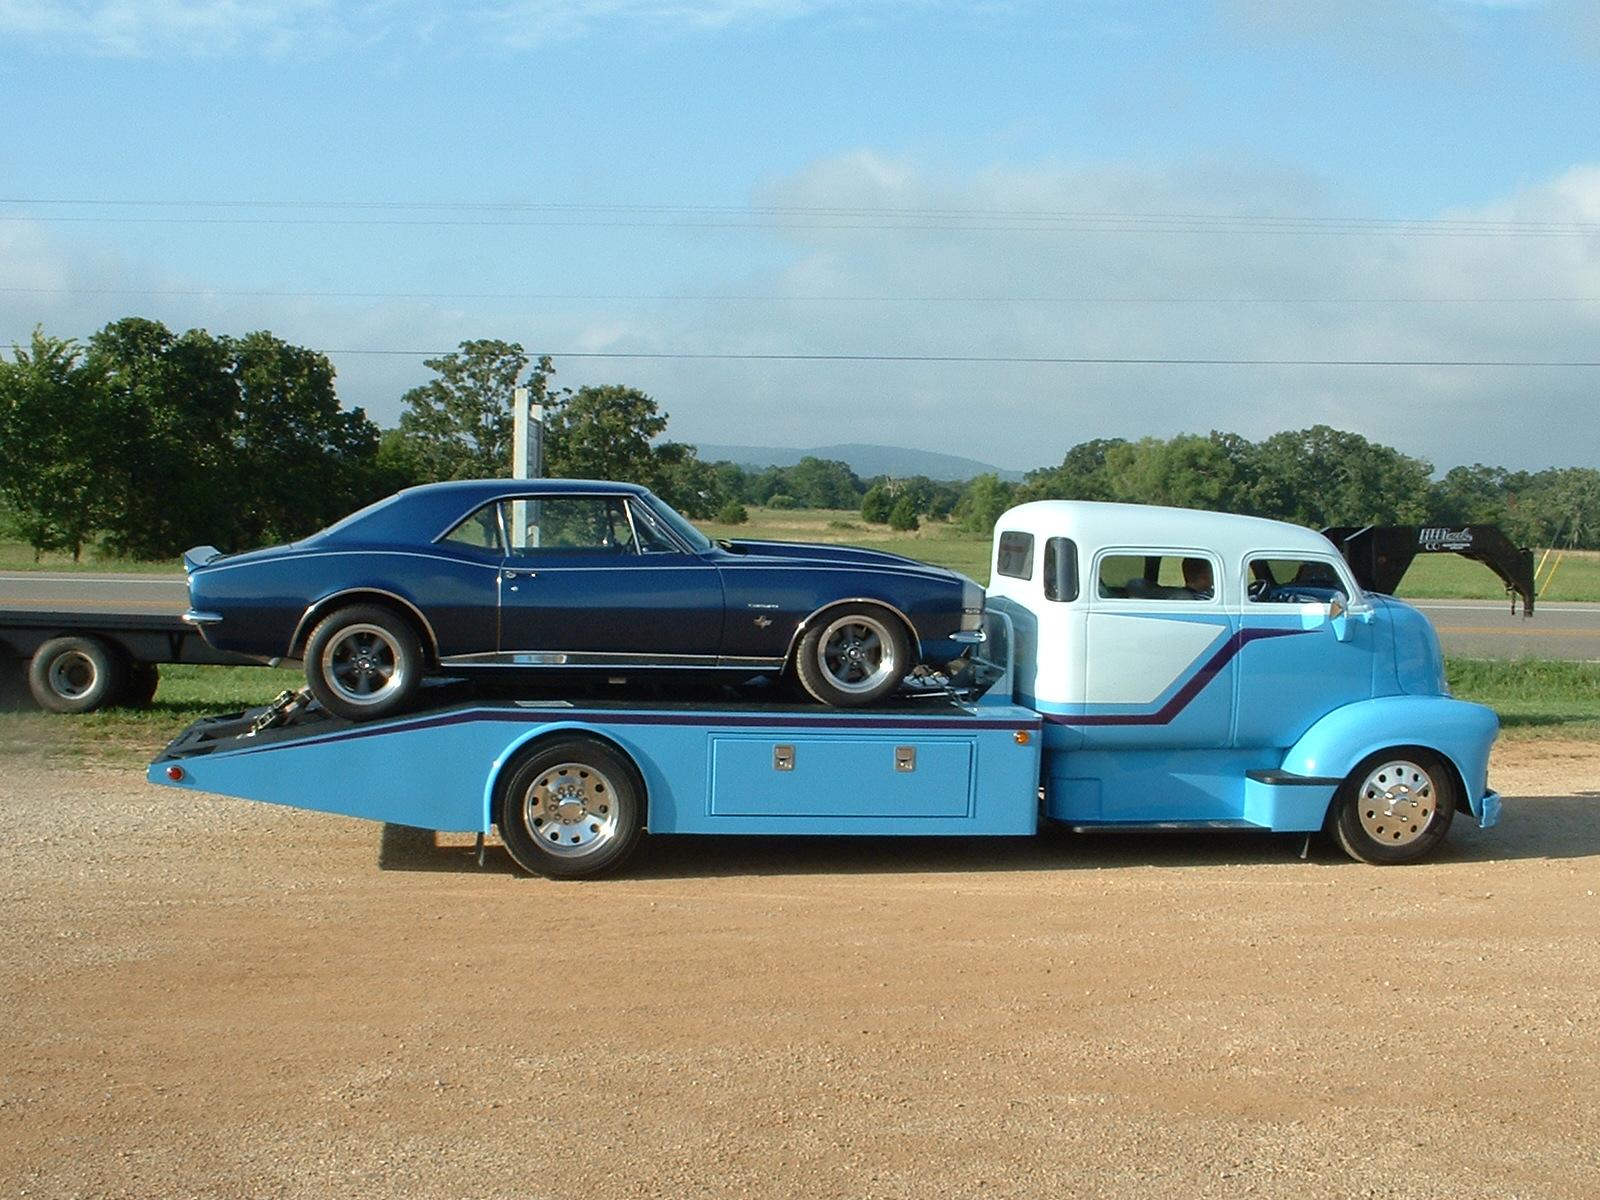 Used Car Hauler Trucks For Sale Autos Post